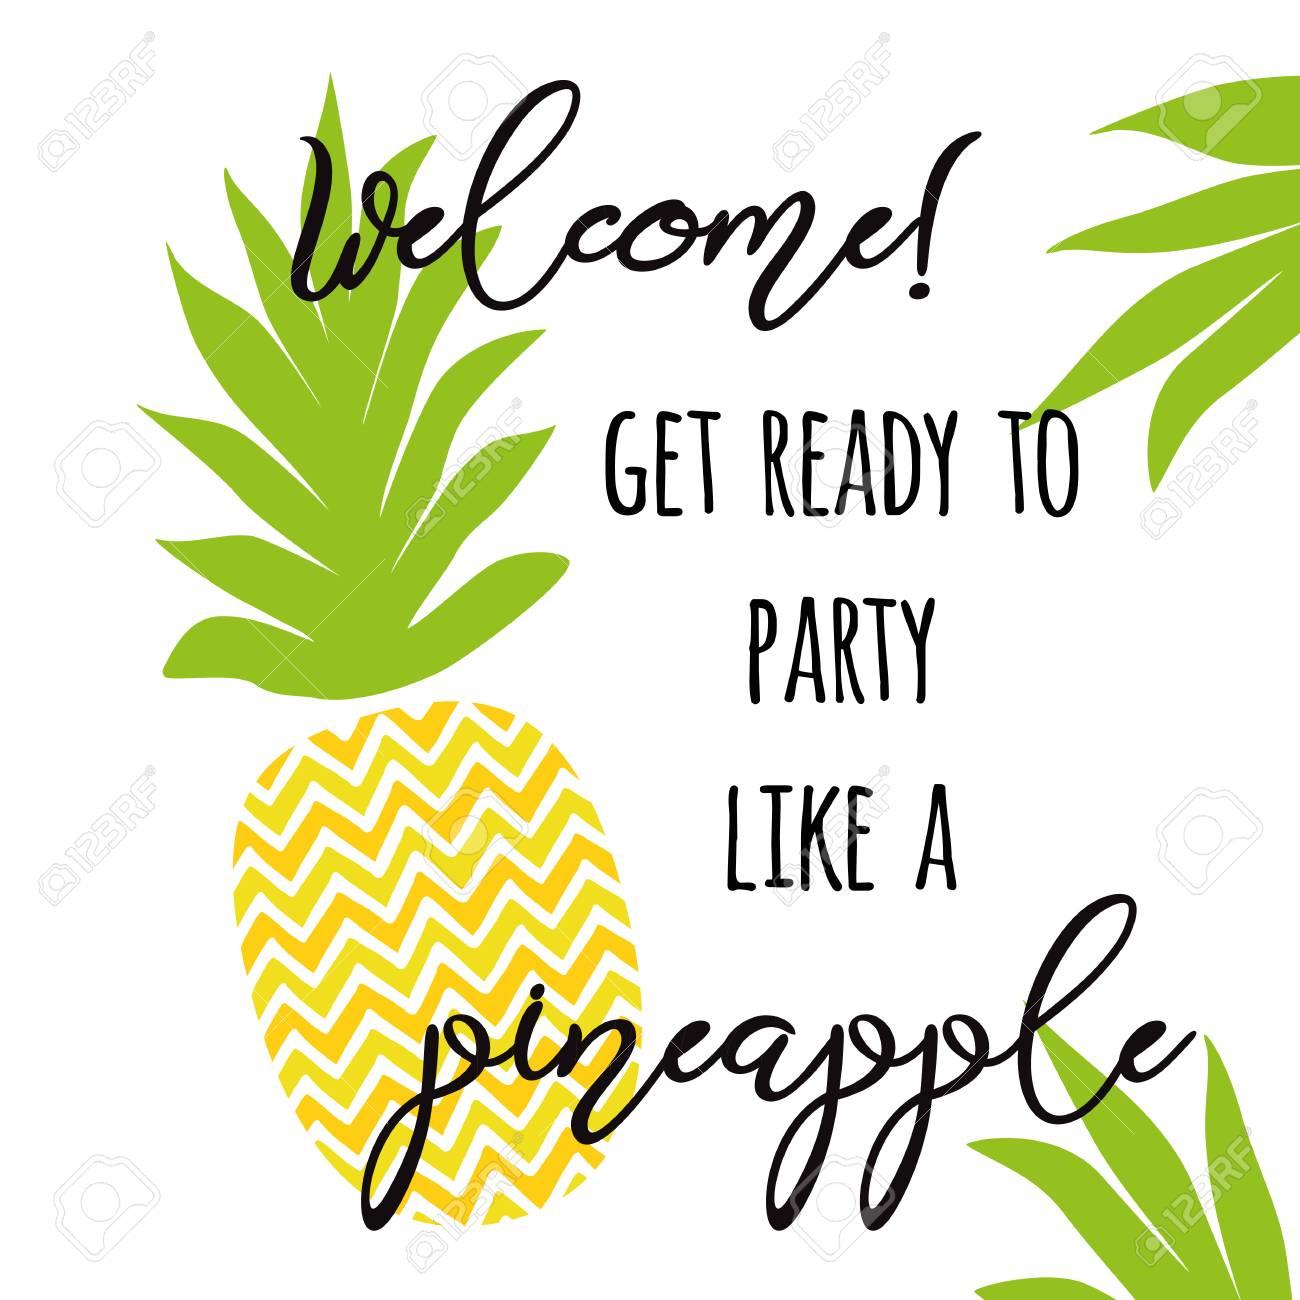 positive summer invitation for pineapple fiesta decorative print